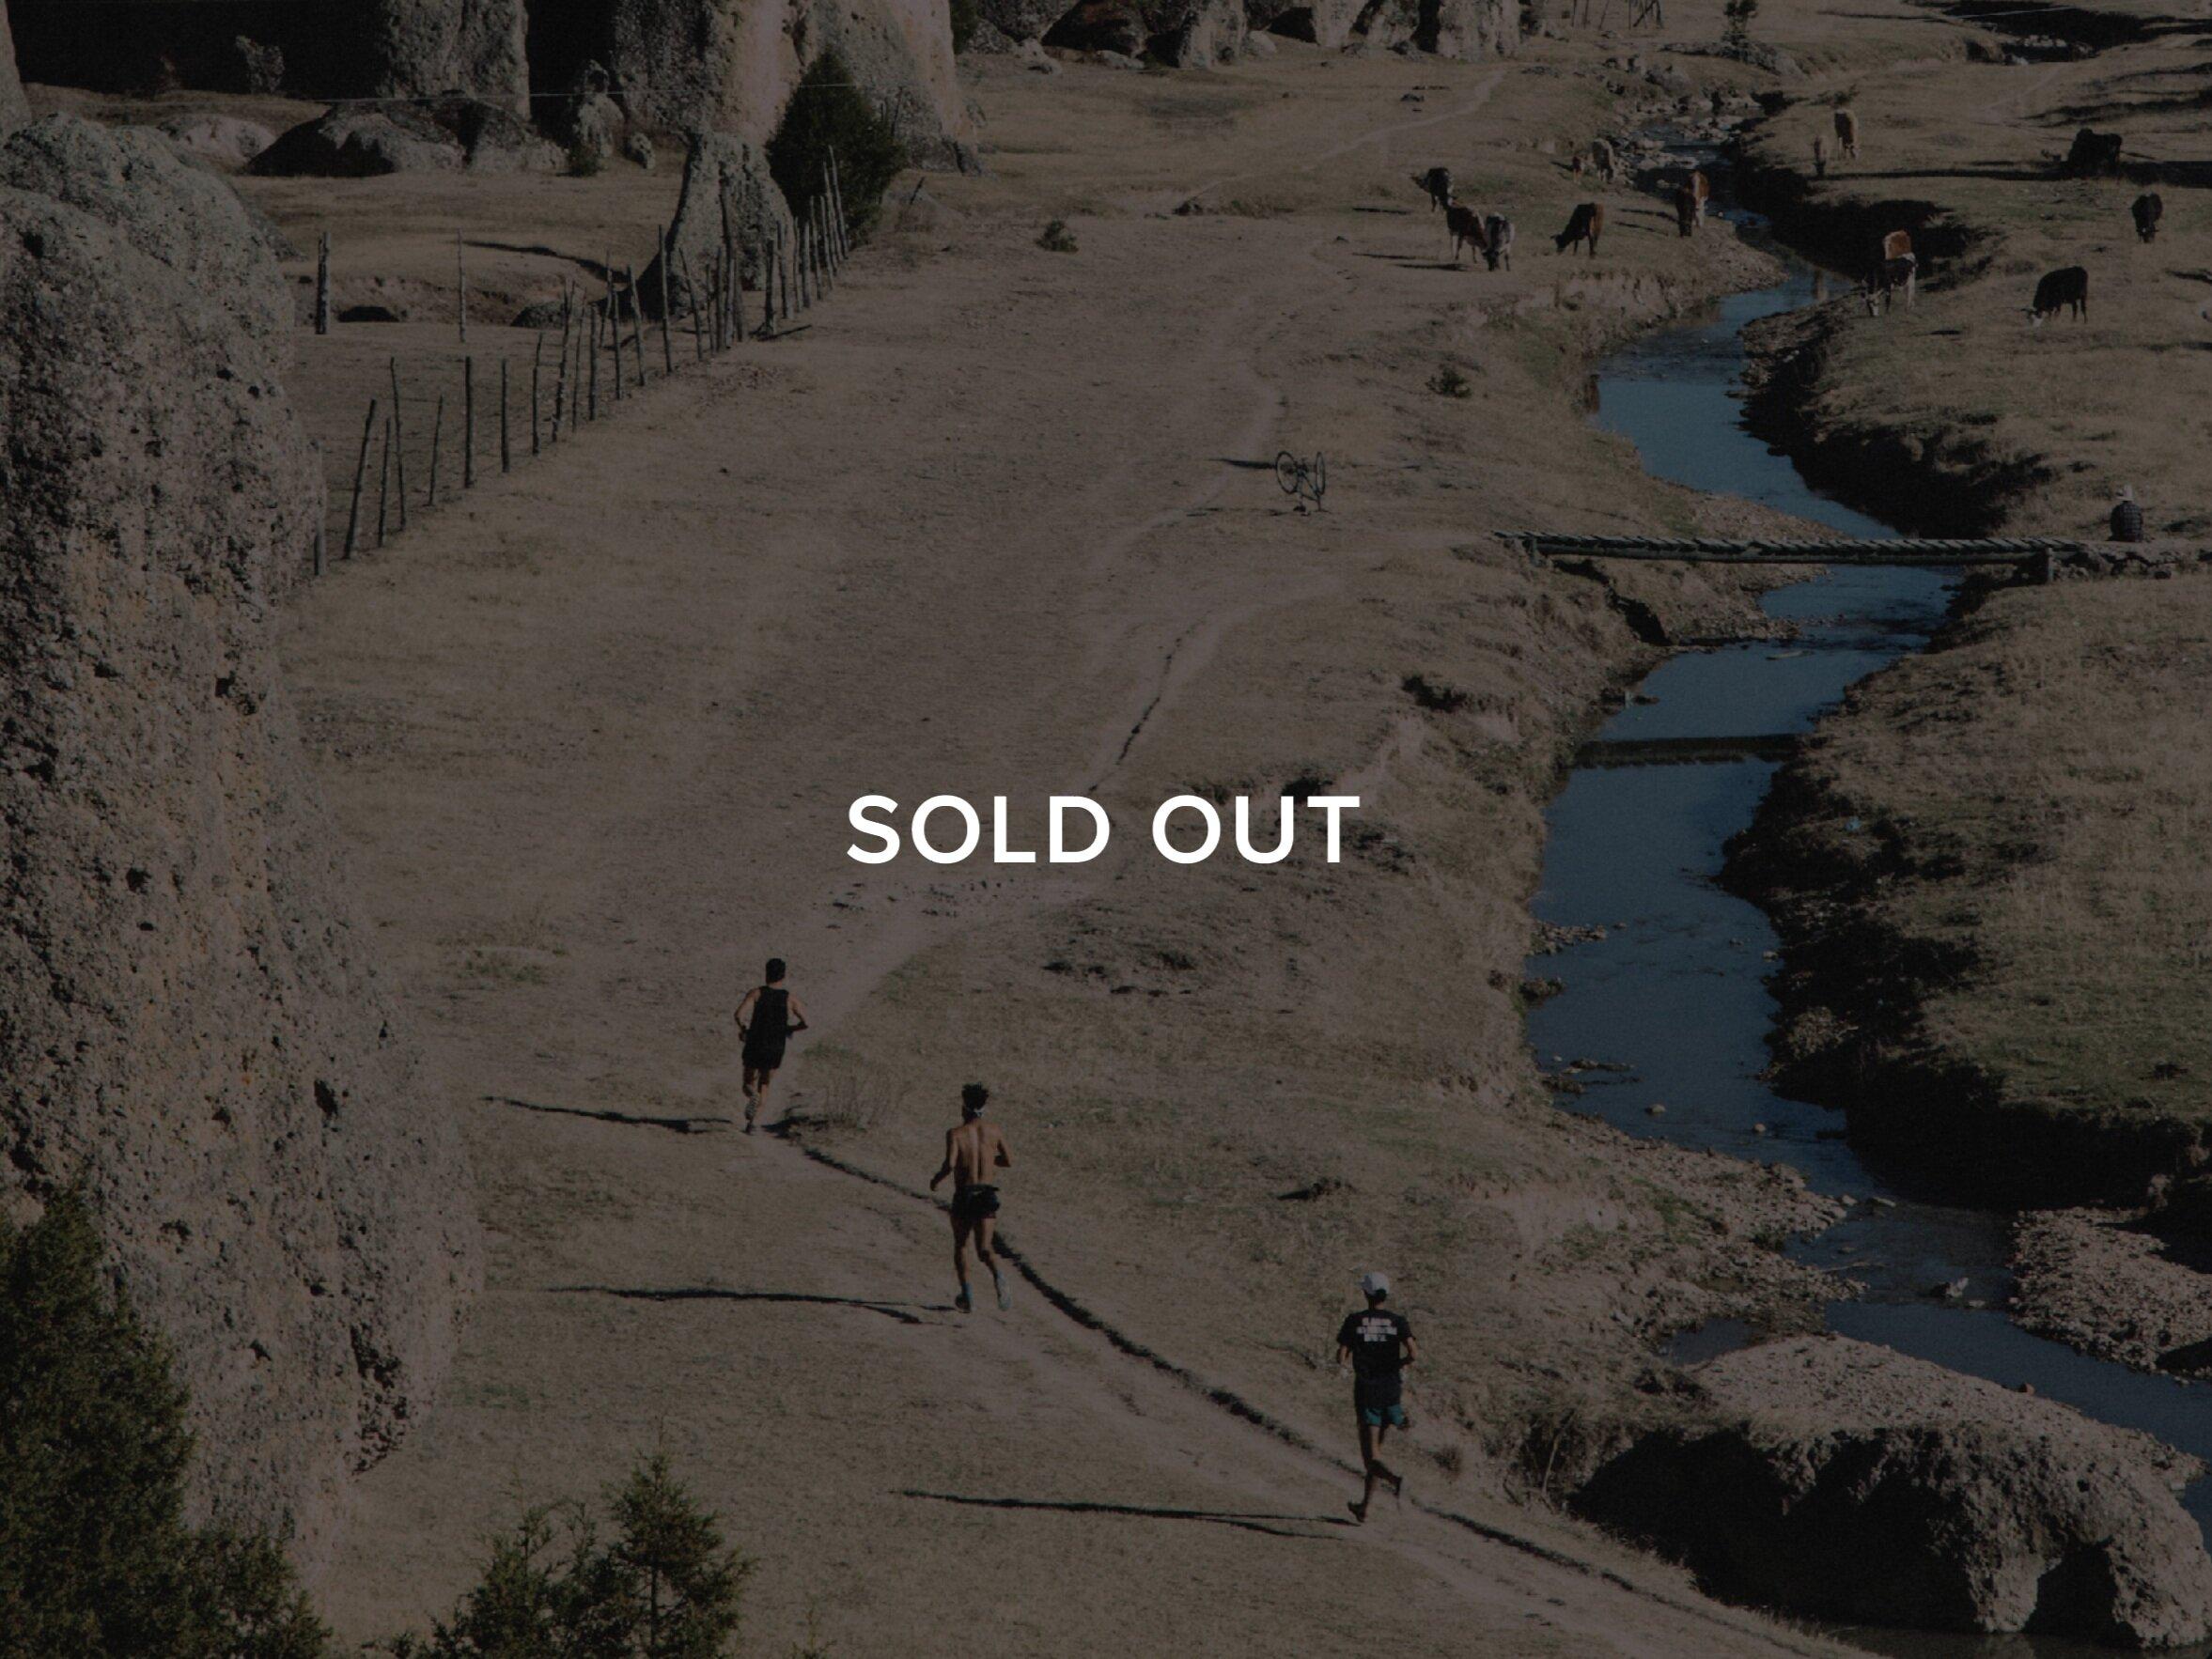 Tarahumara & Copper Canyon Running Holiday - Oct 10th - 15th, 2019